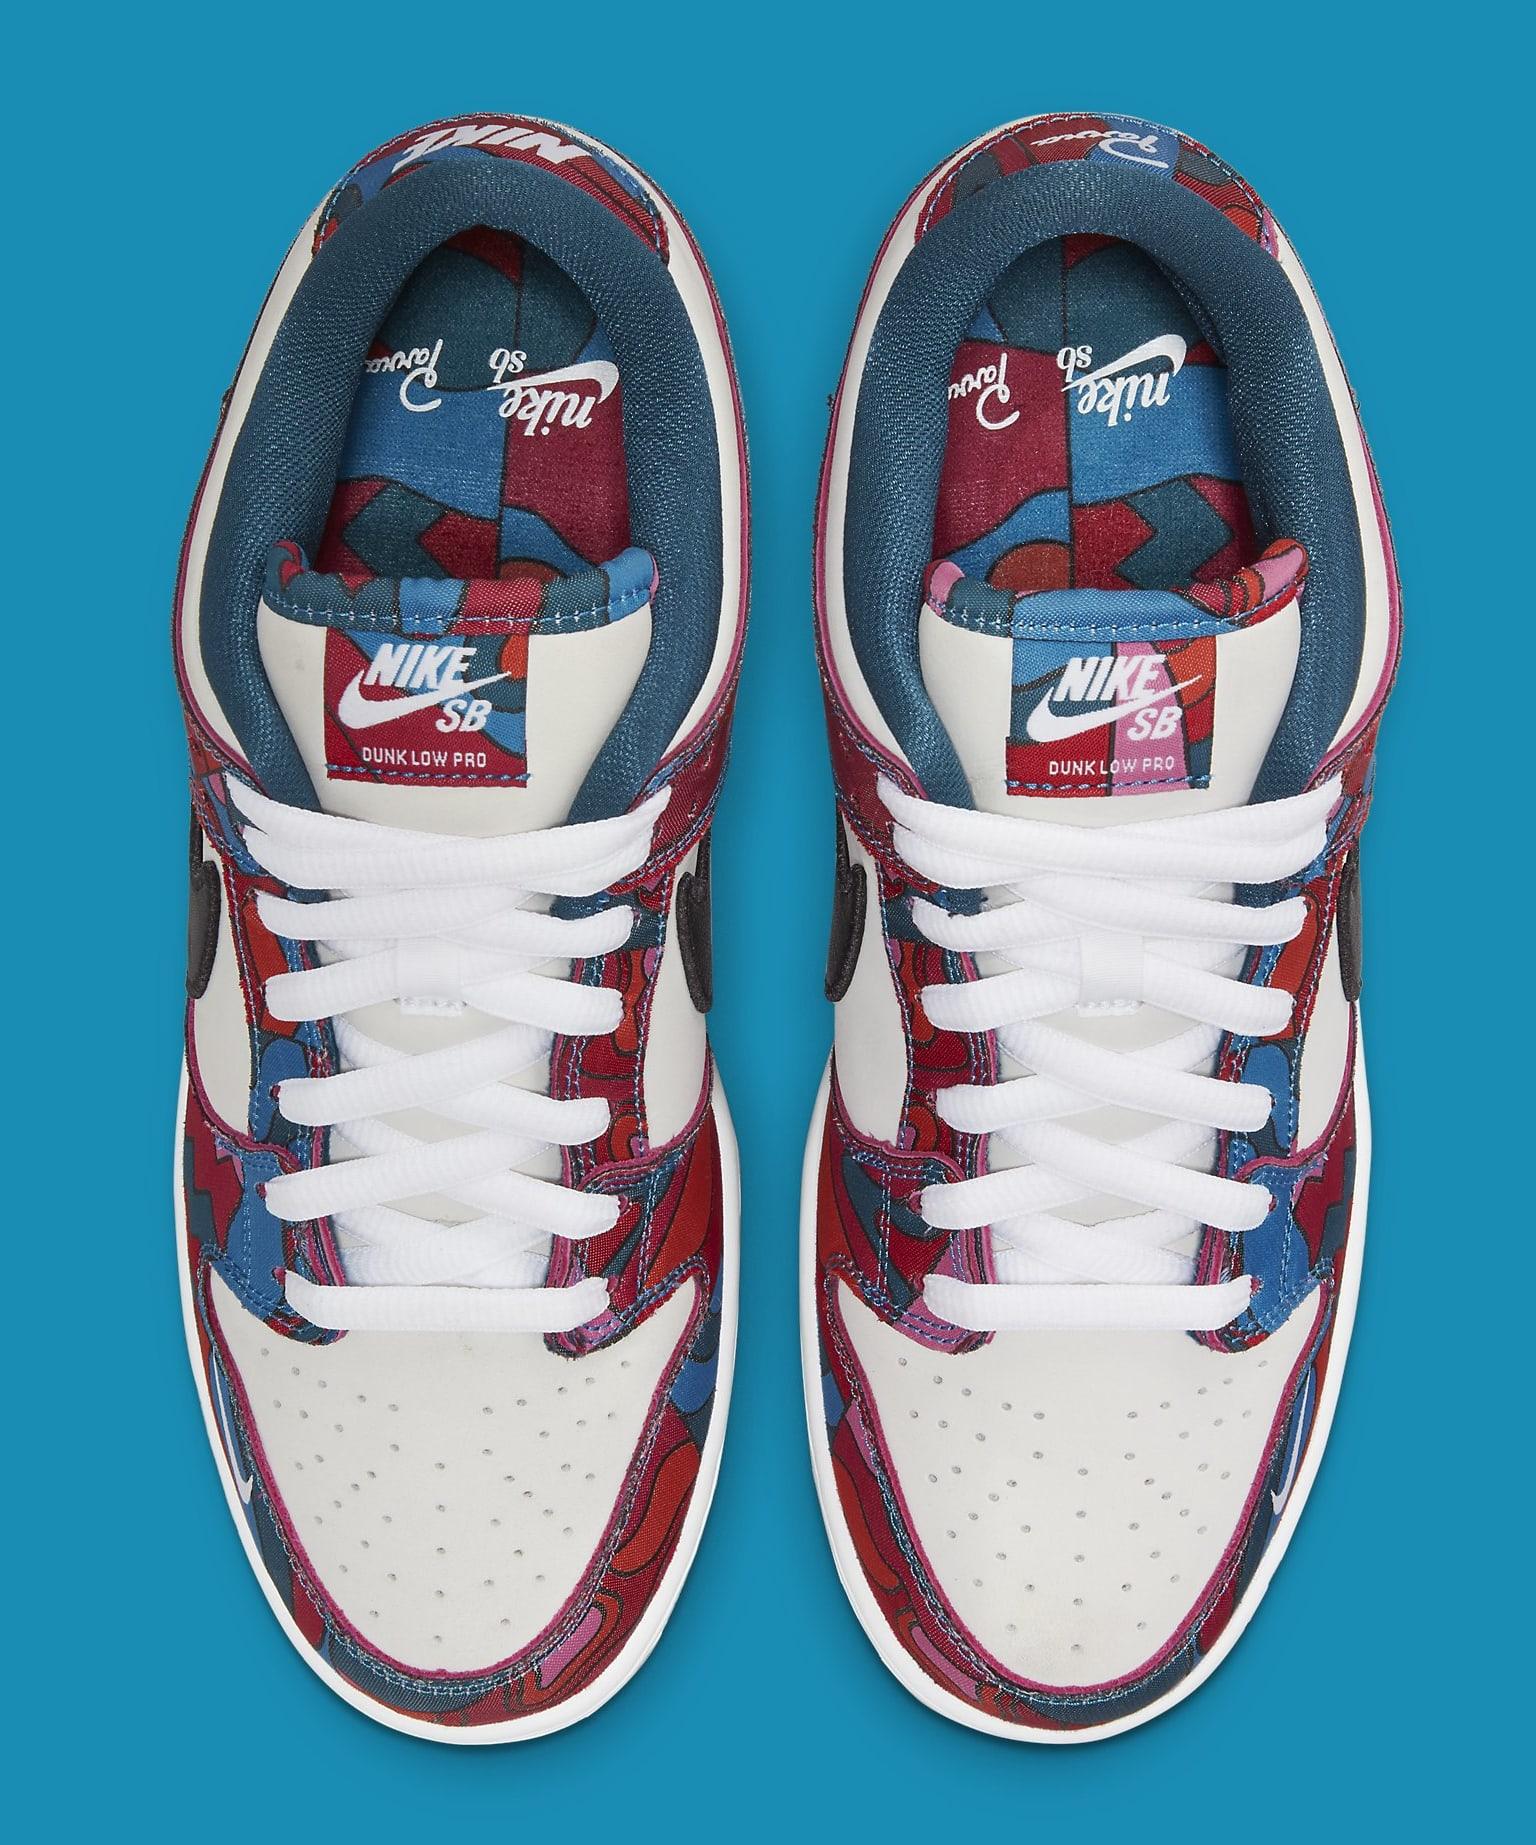 Parra x Nike SB Dunk Low DH7695-600 Top